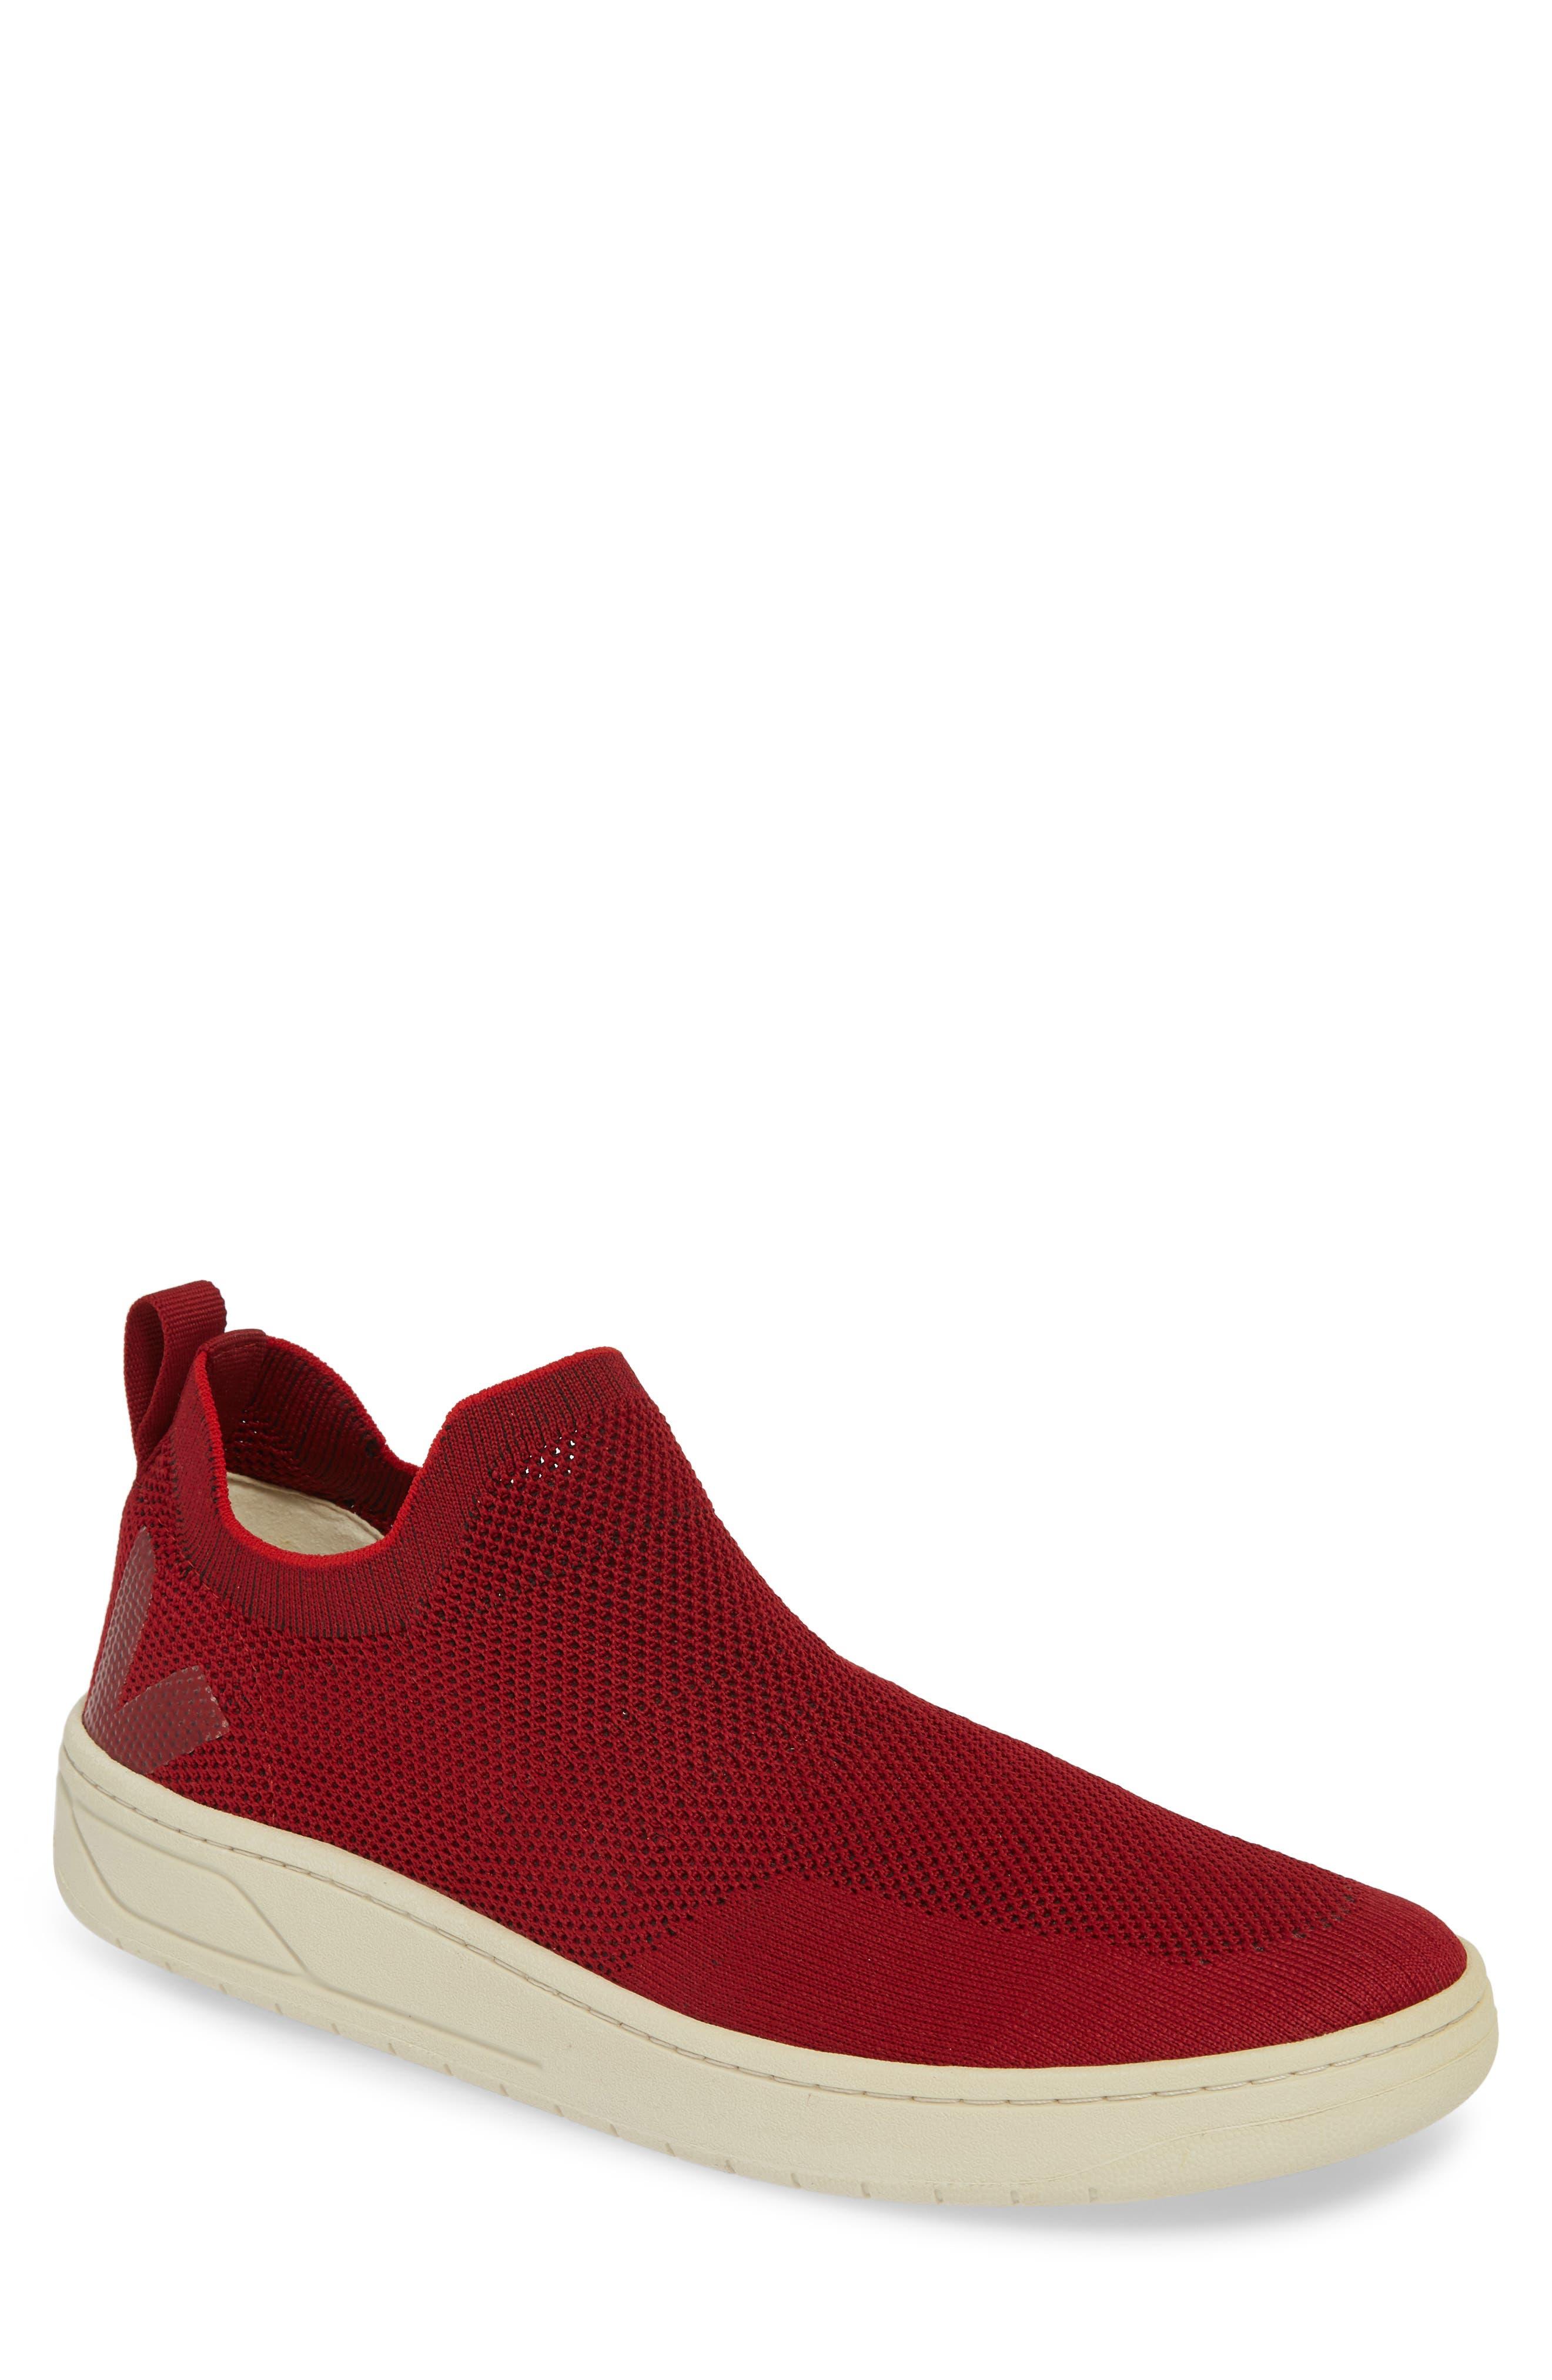 Veja X Lemaire Aquashoe Sneaker, Red